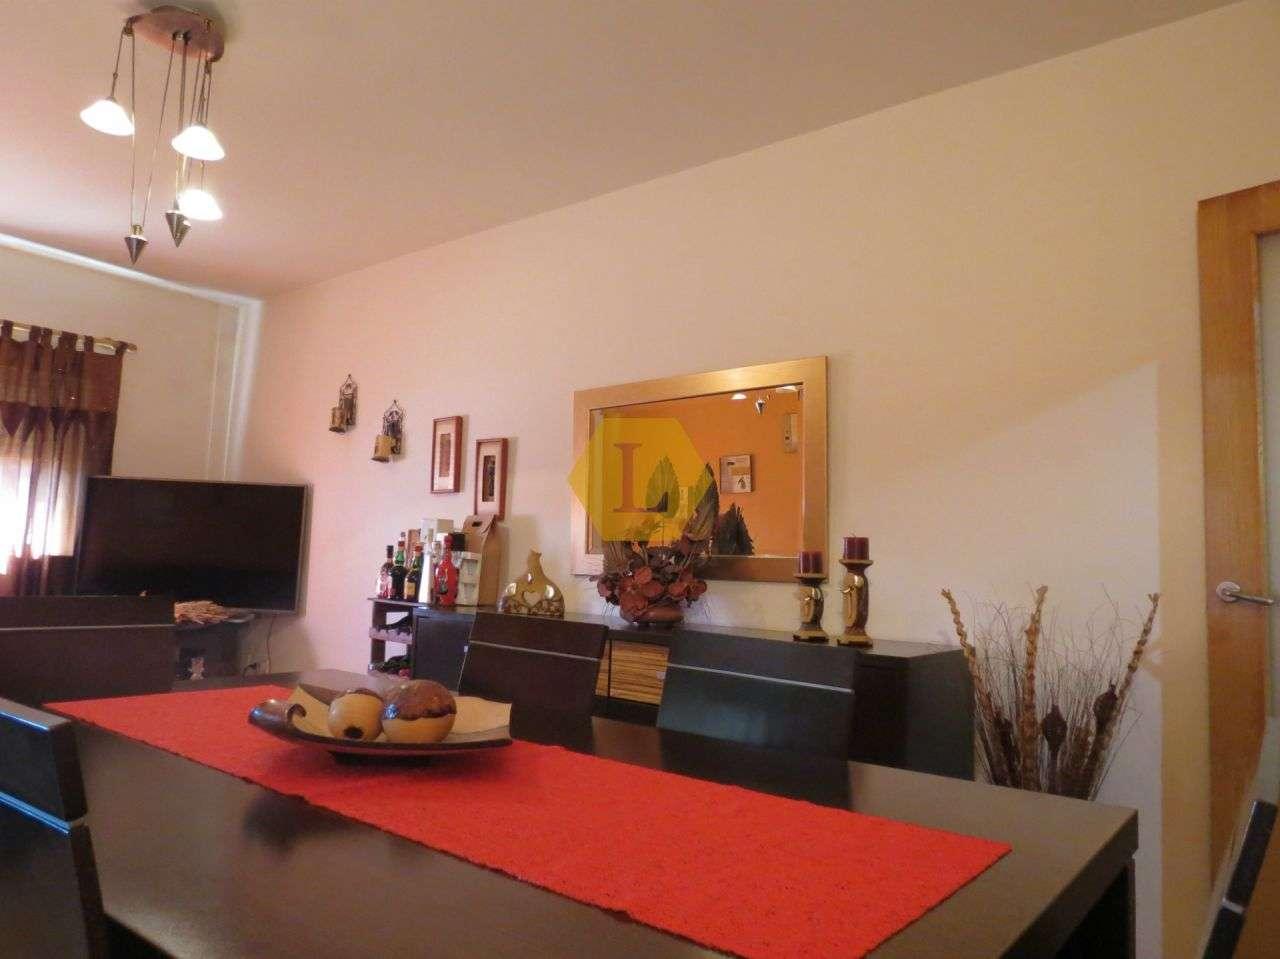 Apartamento para comprar, Gafanha da Nazaré, Aveiro - Foto 6